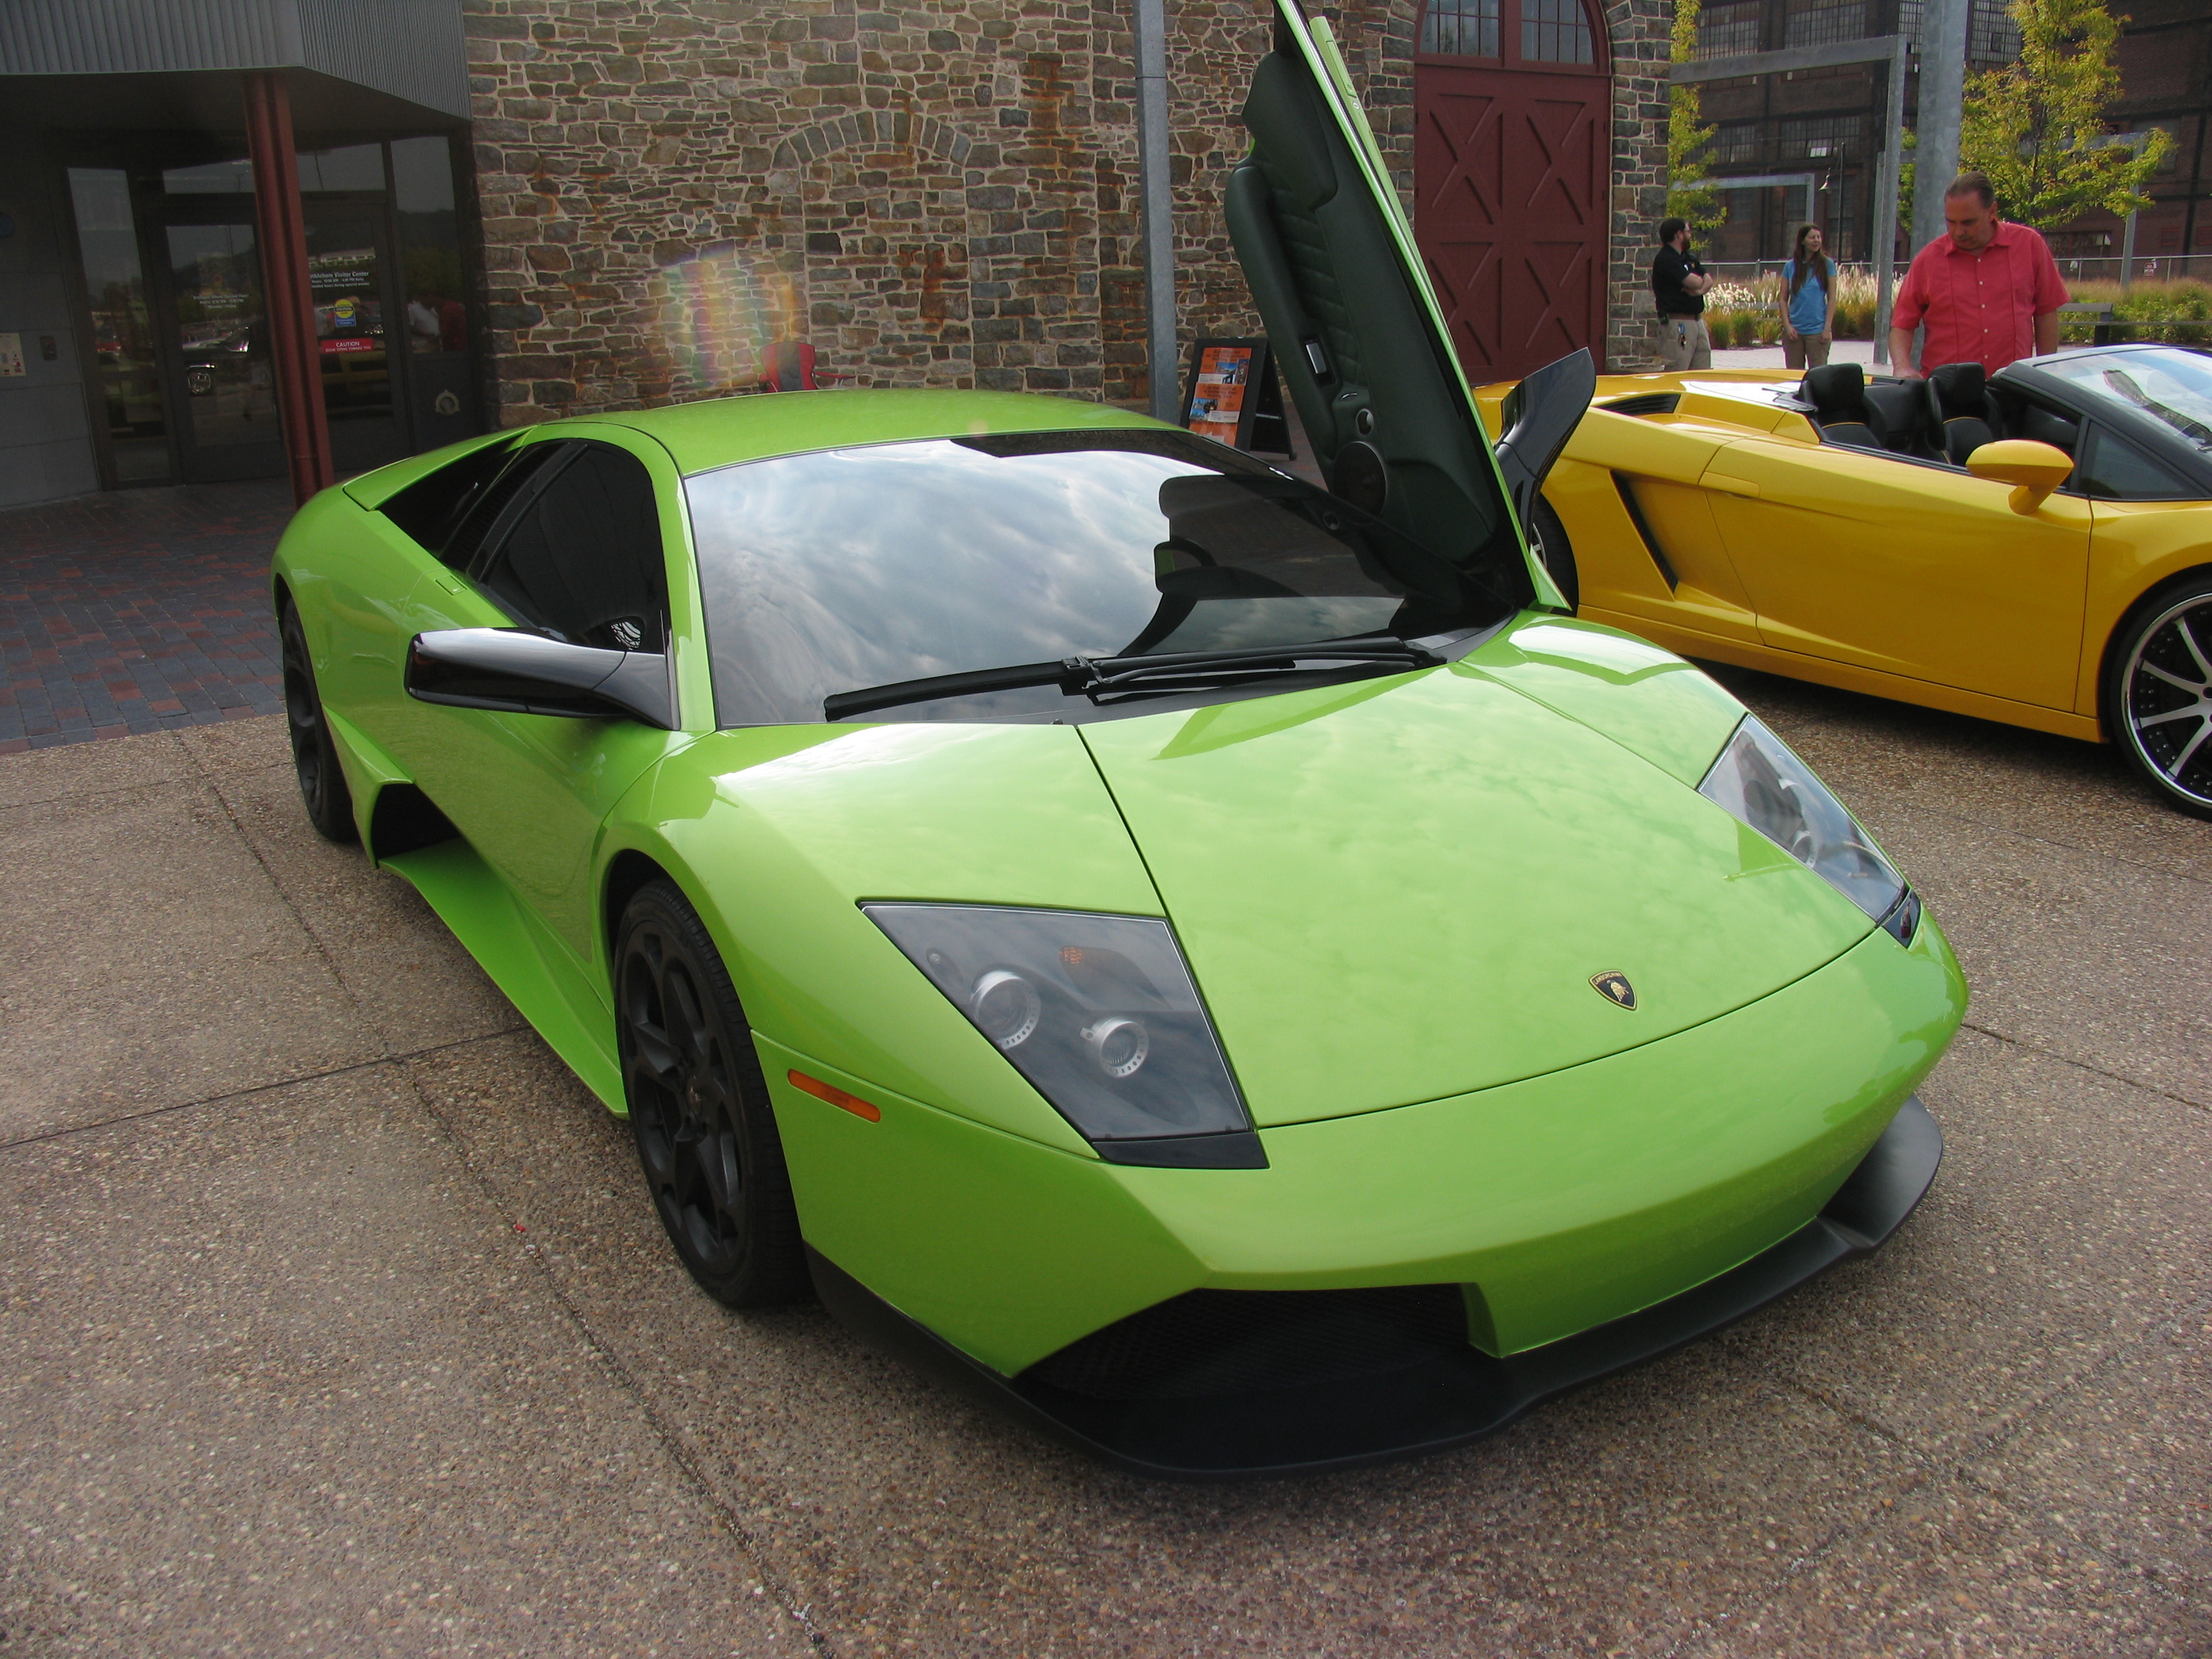 File Lamborghini Murcielago Lp640 4 9704003910 Jpg Wikimedia Commons